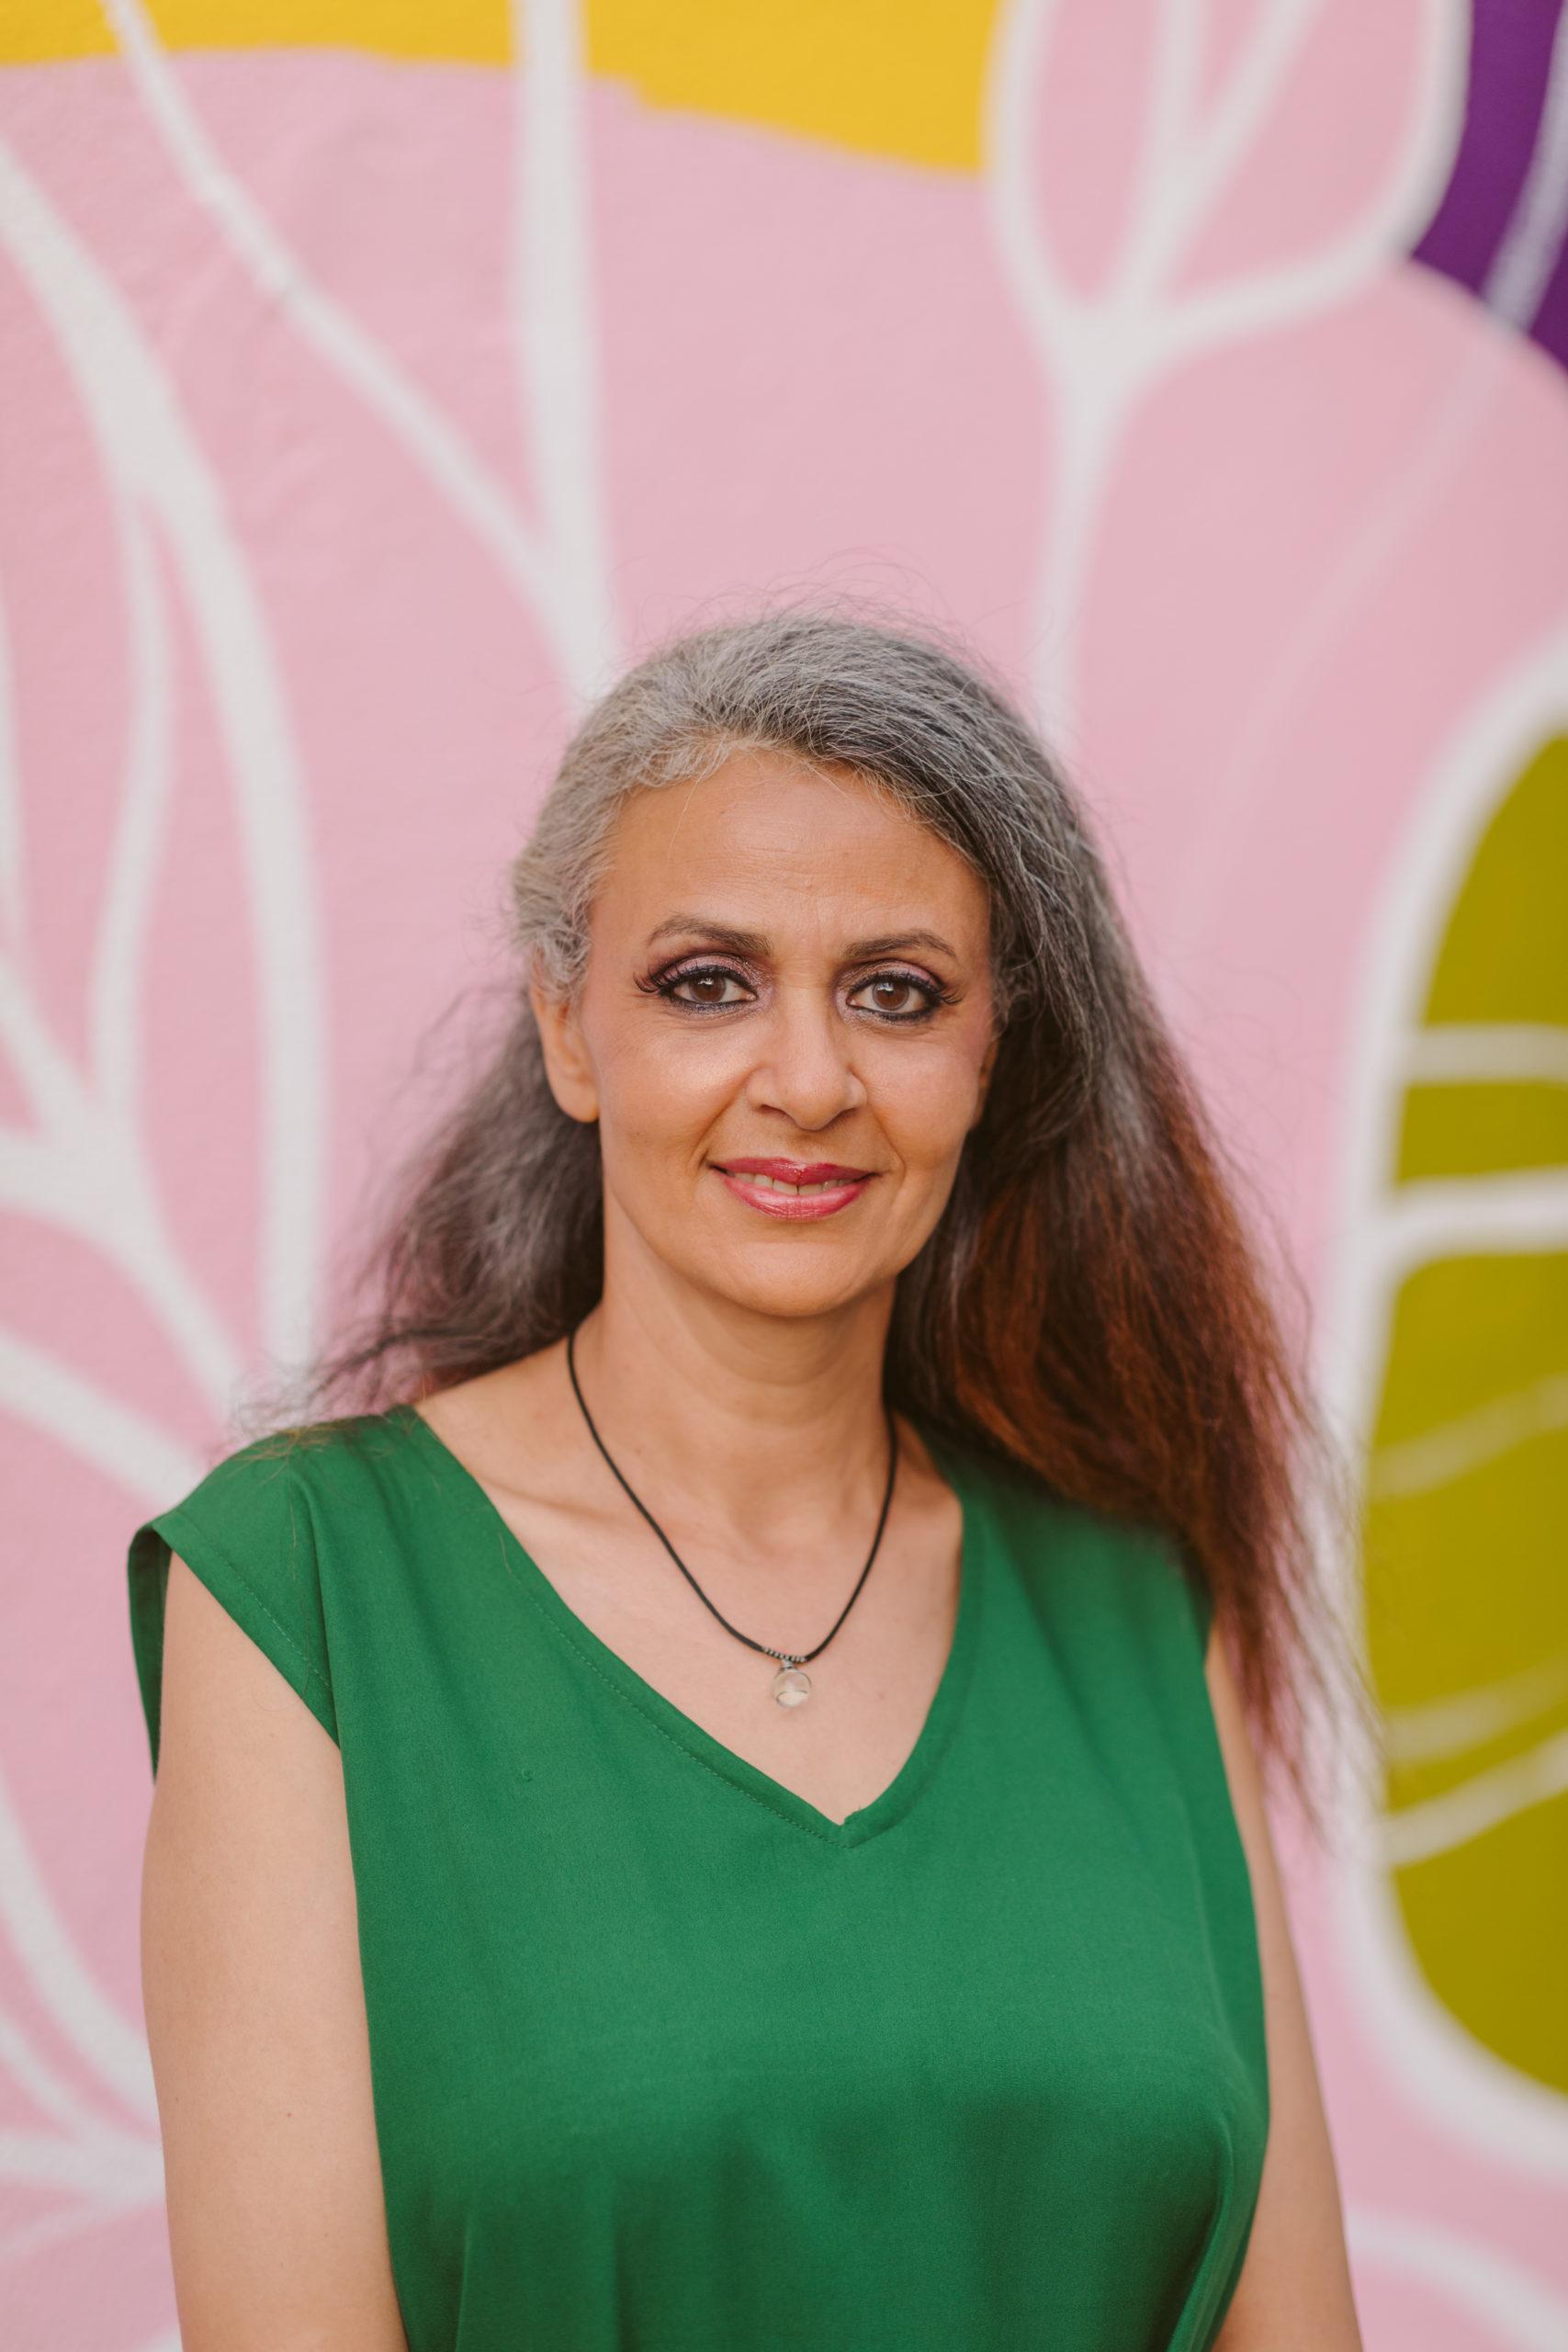 Maryem Tollar - Pink wall